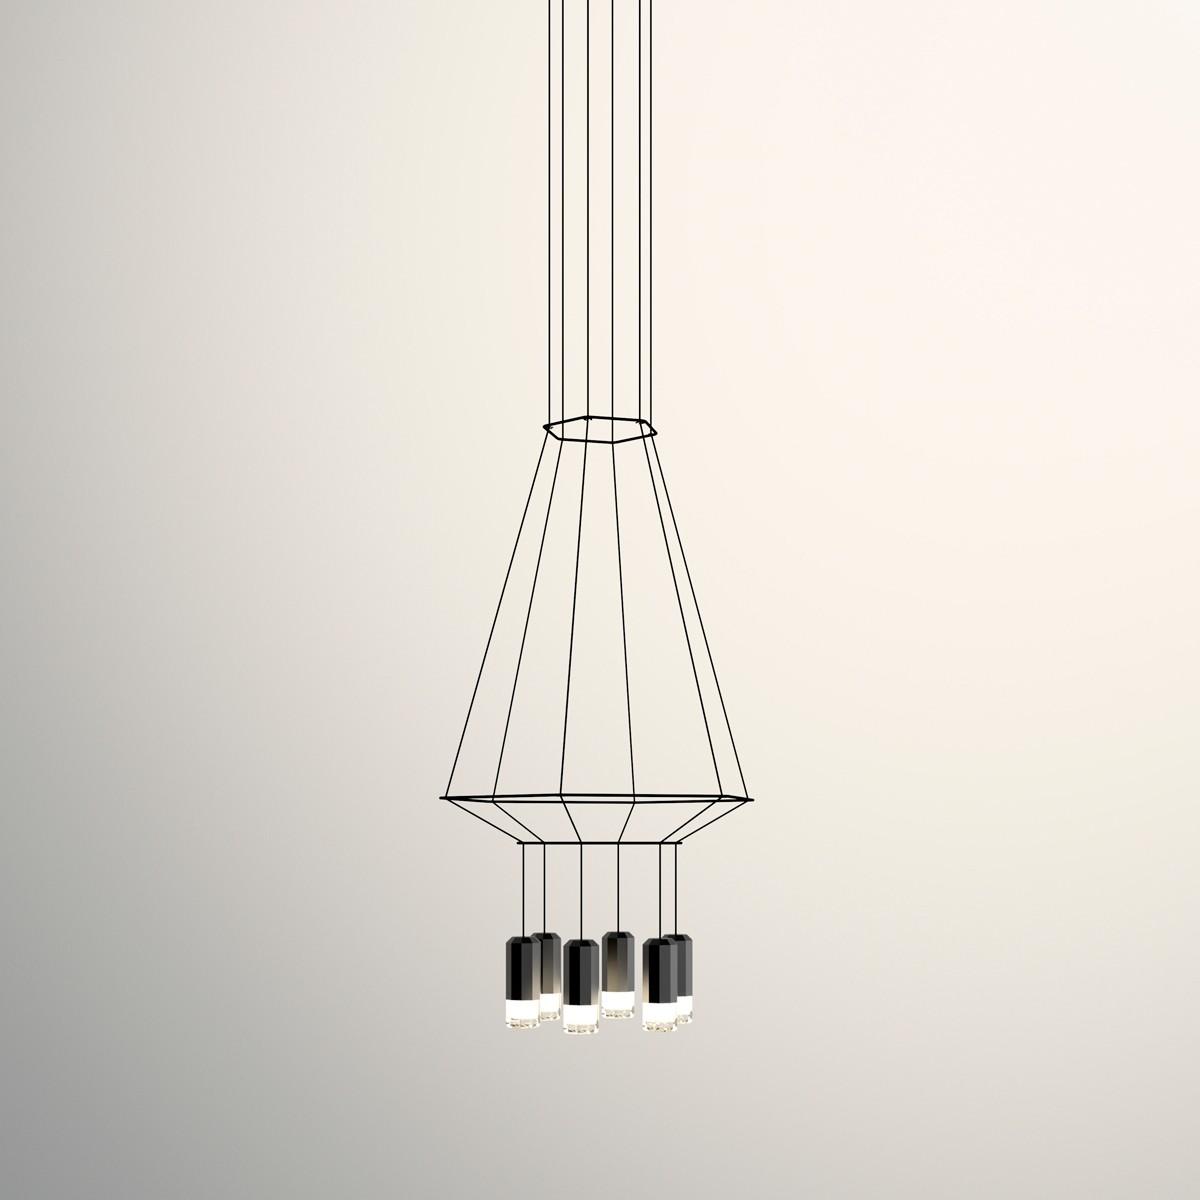 Vibia Wireflow Pendelleuchte, 6-flg., 40 x 46 cm, schwarz